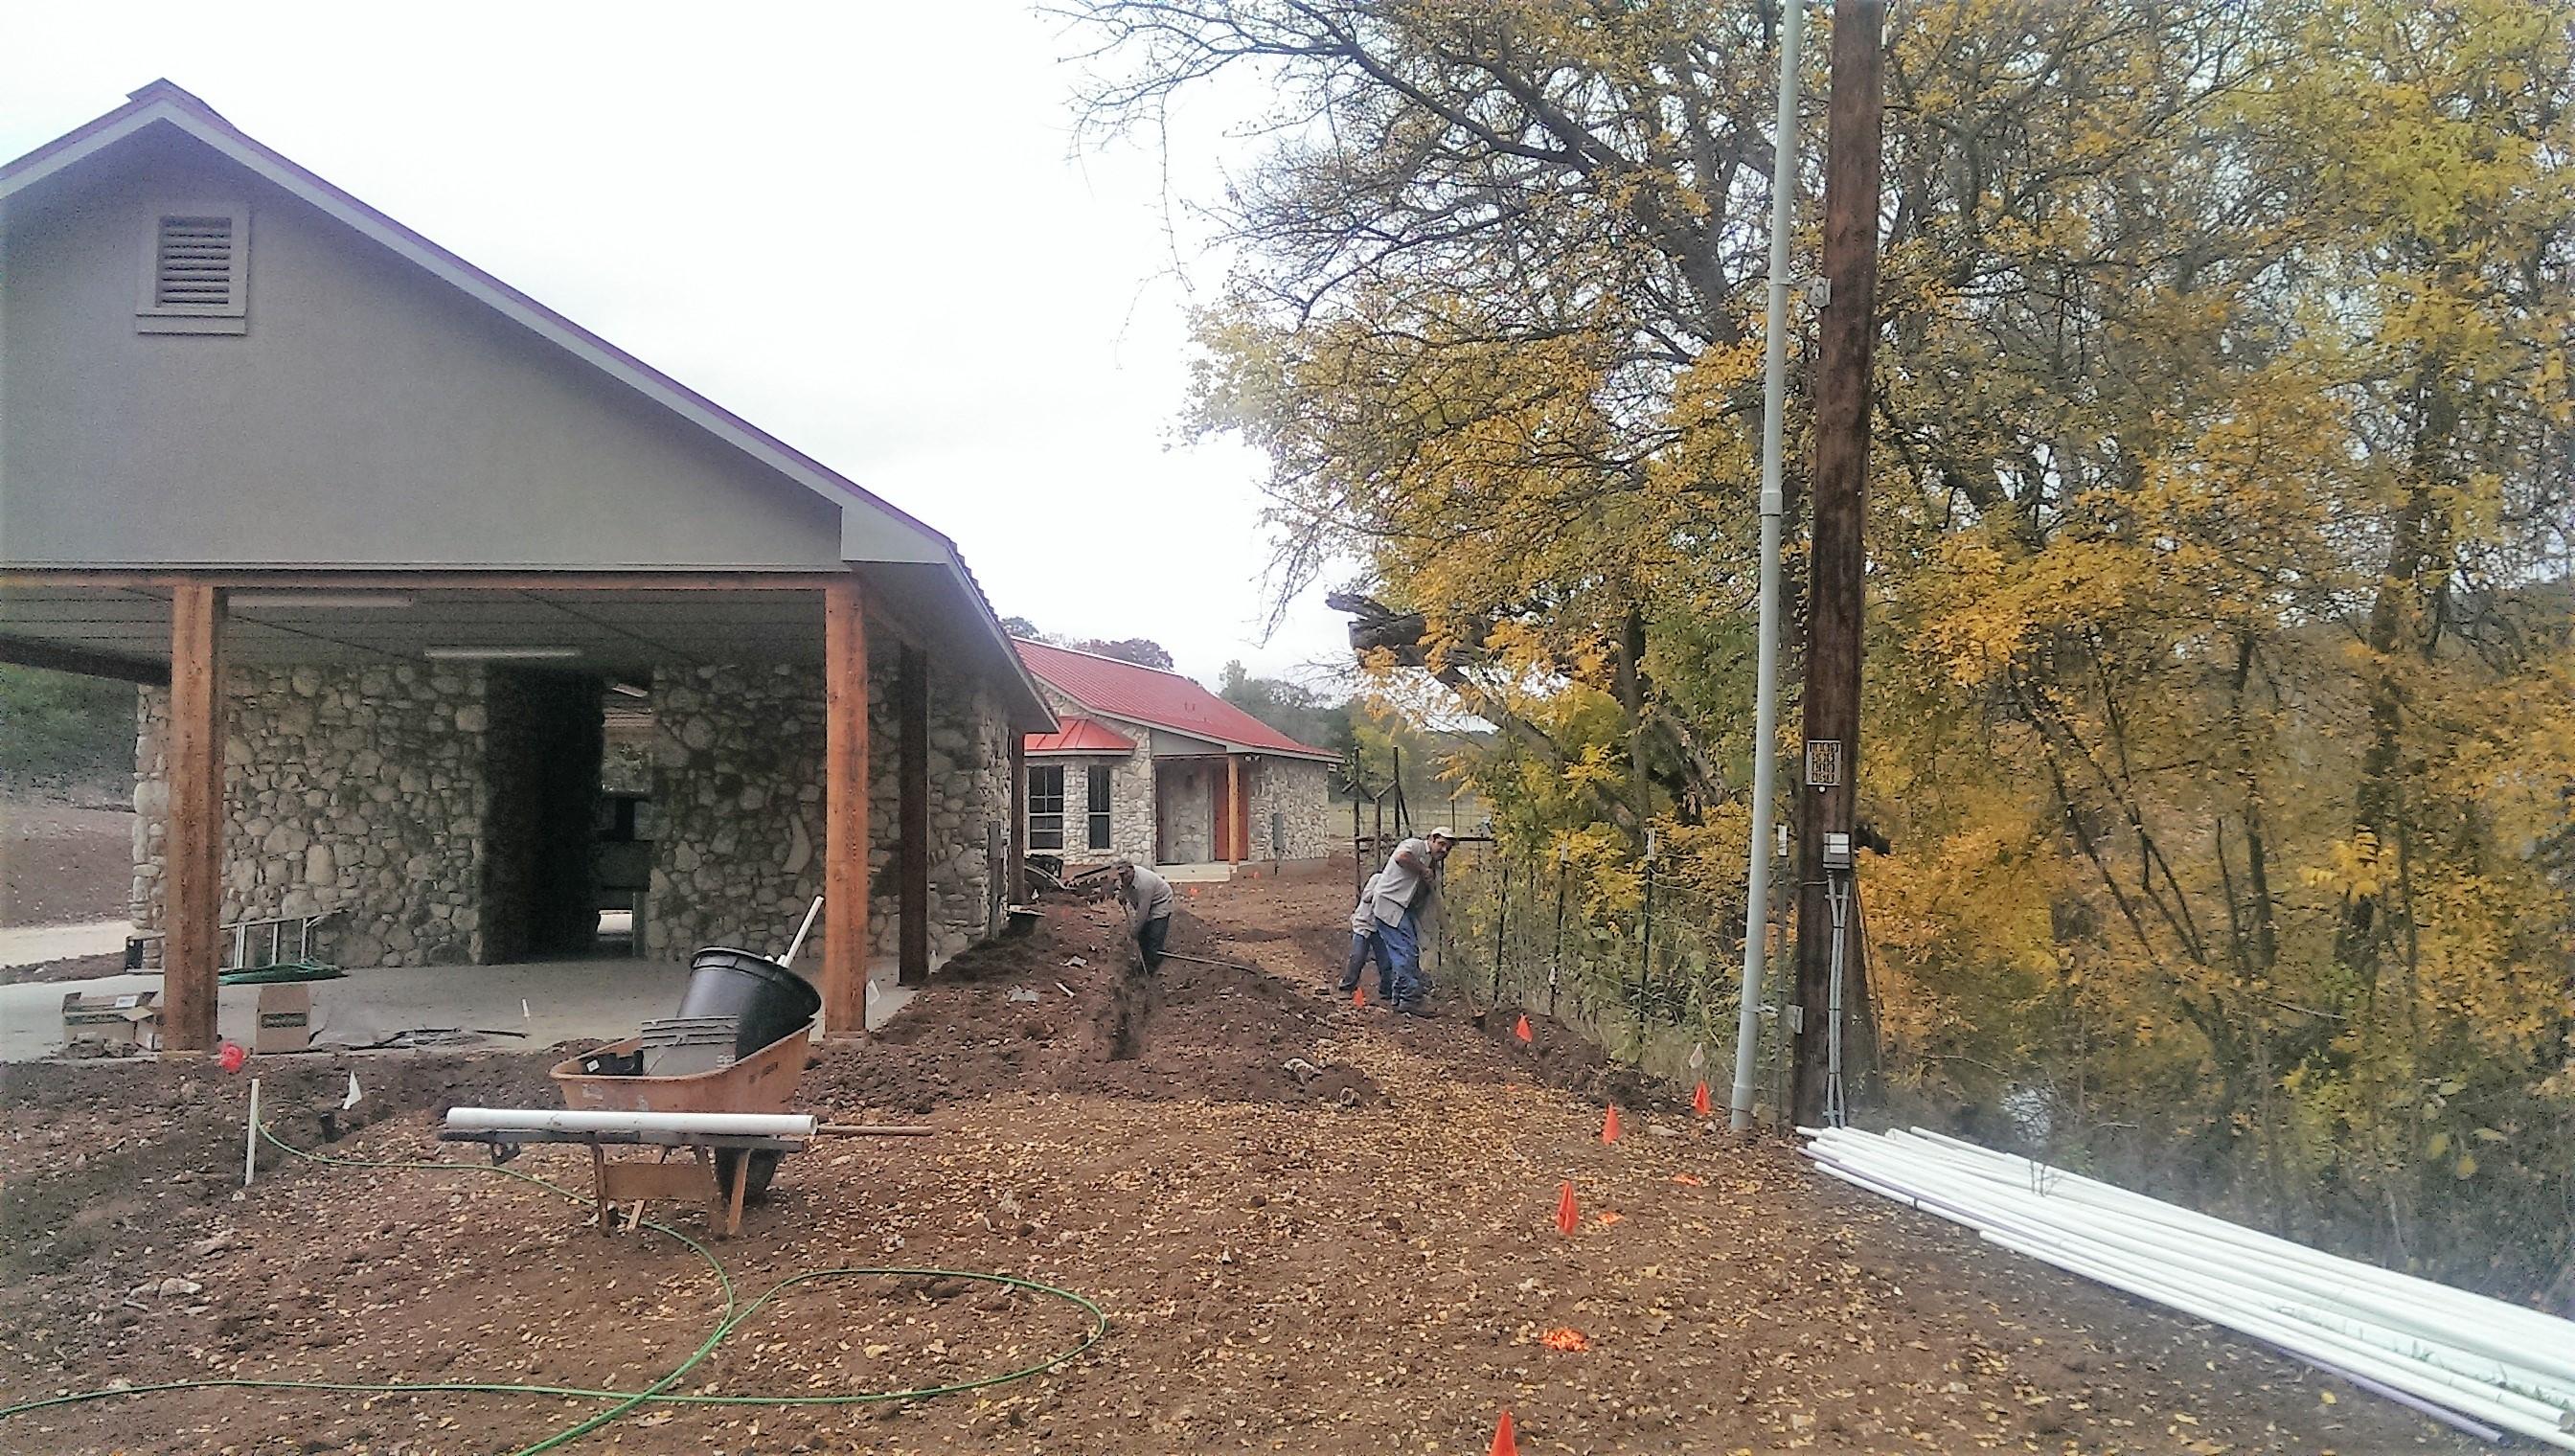 Team Installing Irrigation Lines